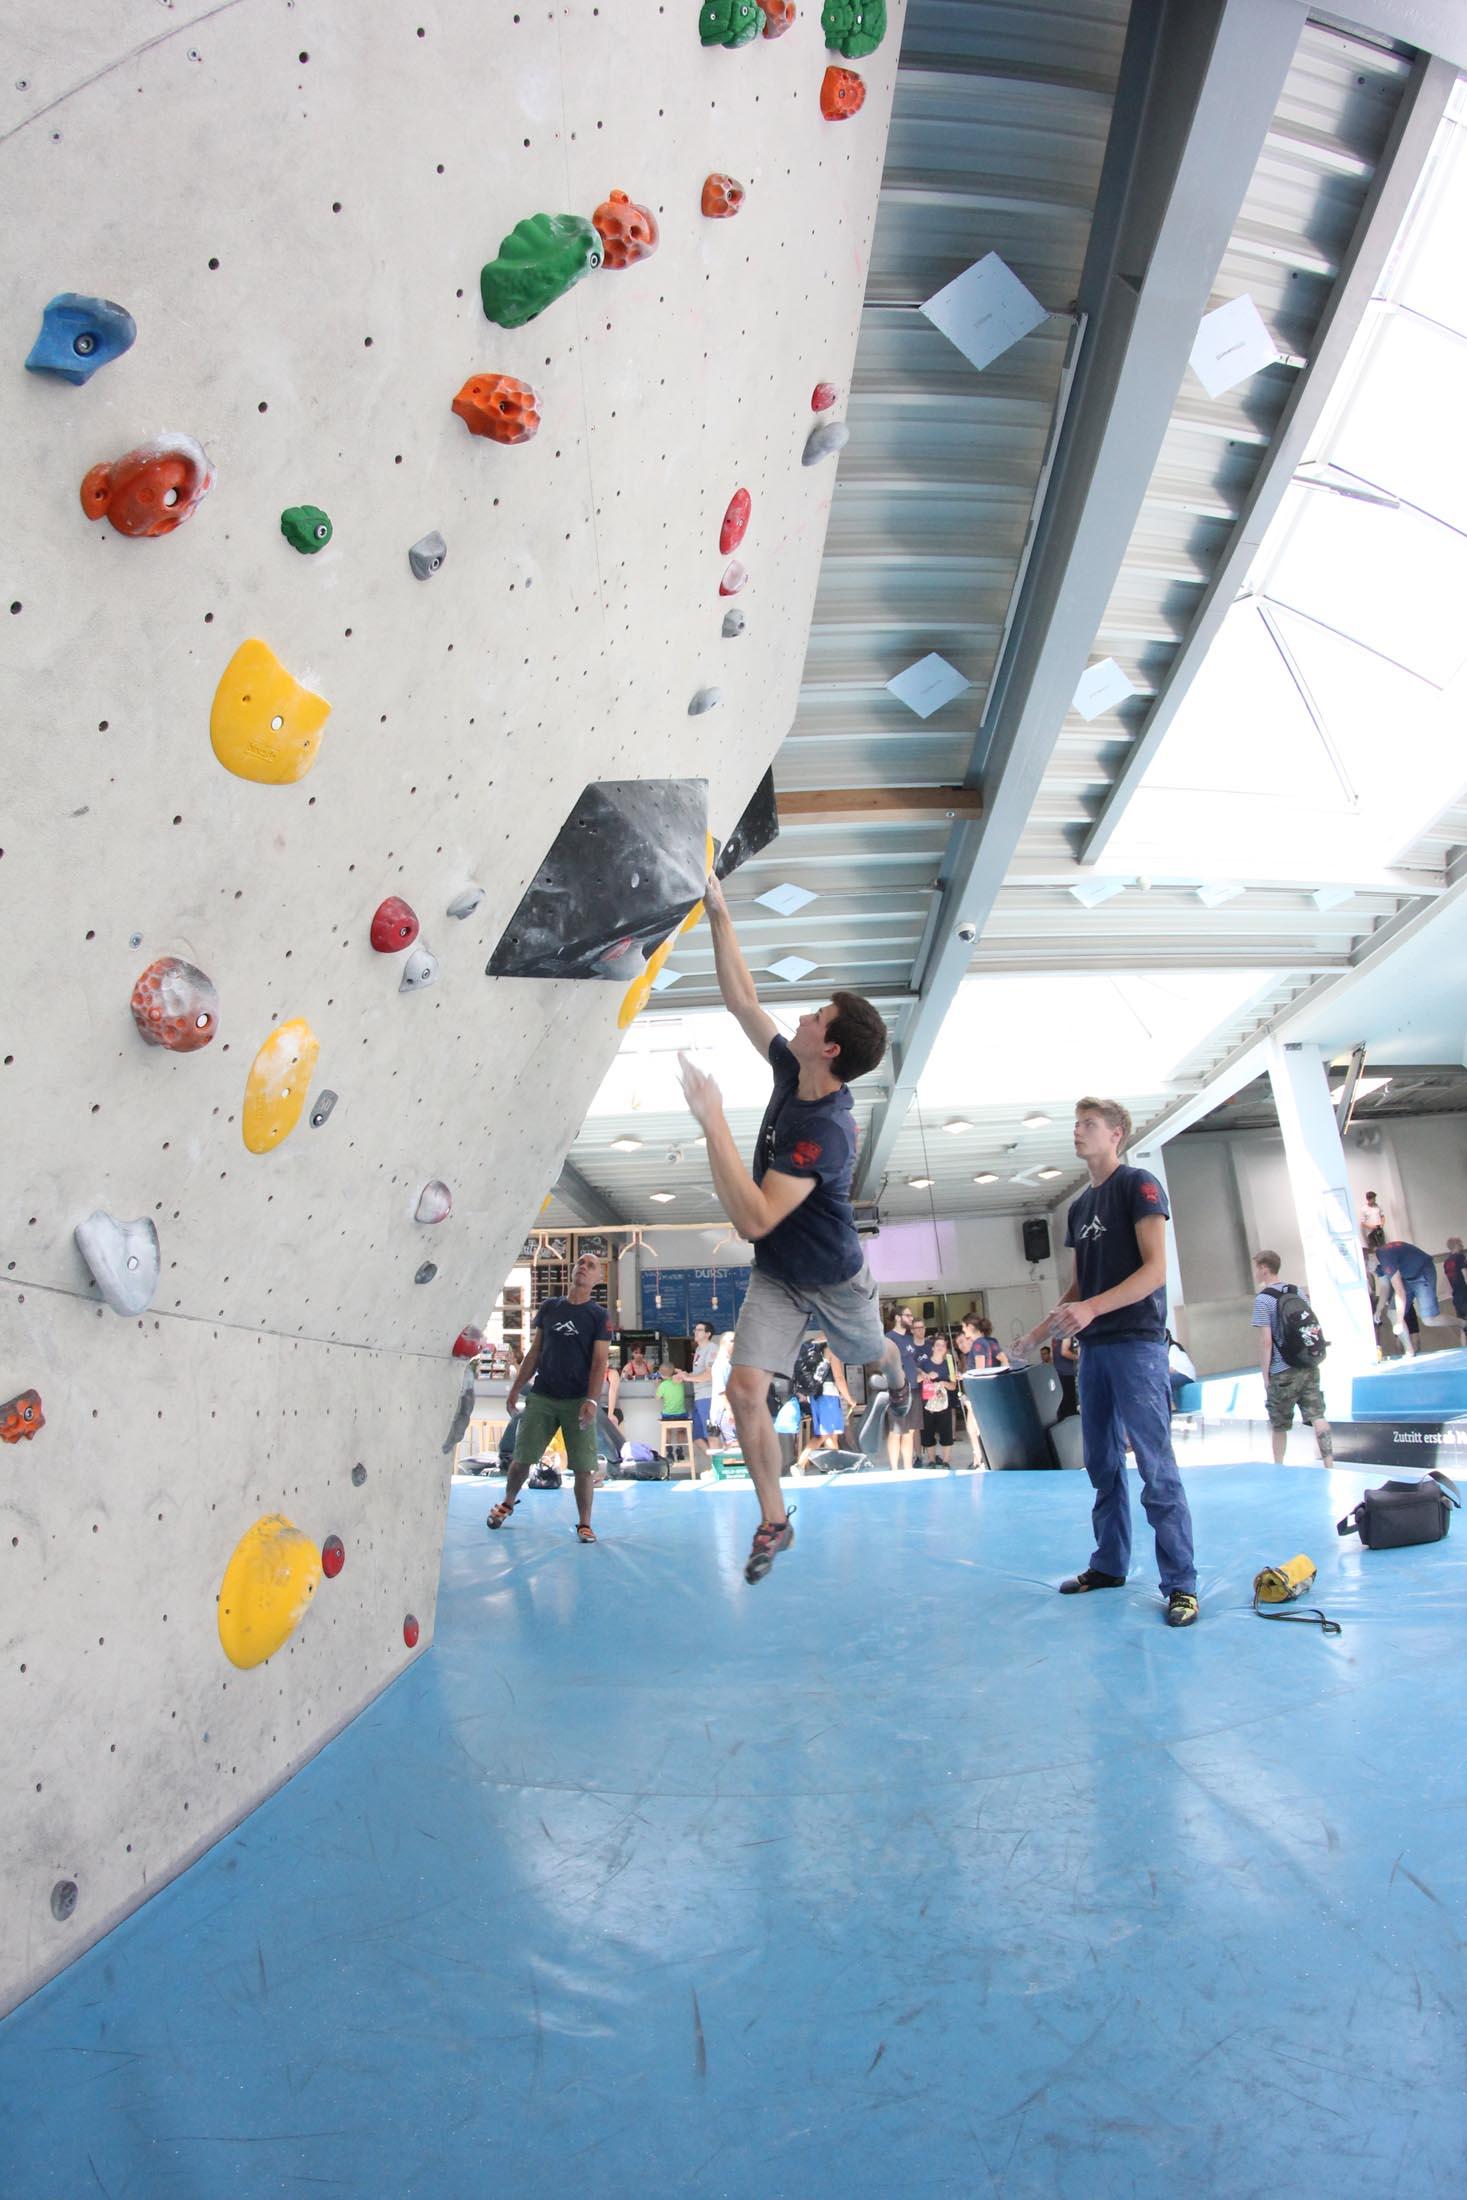 Quali, internationaler bouldercup Frankenjura 2016, BLOCKHELDEN Erlangen, Mammut, Bergfreunde.de, Boulderwettkampf07092016124